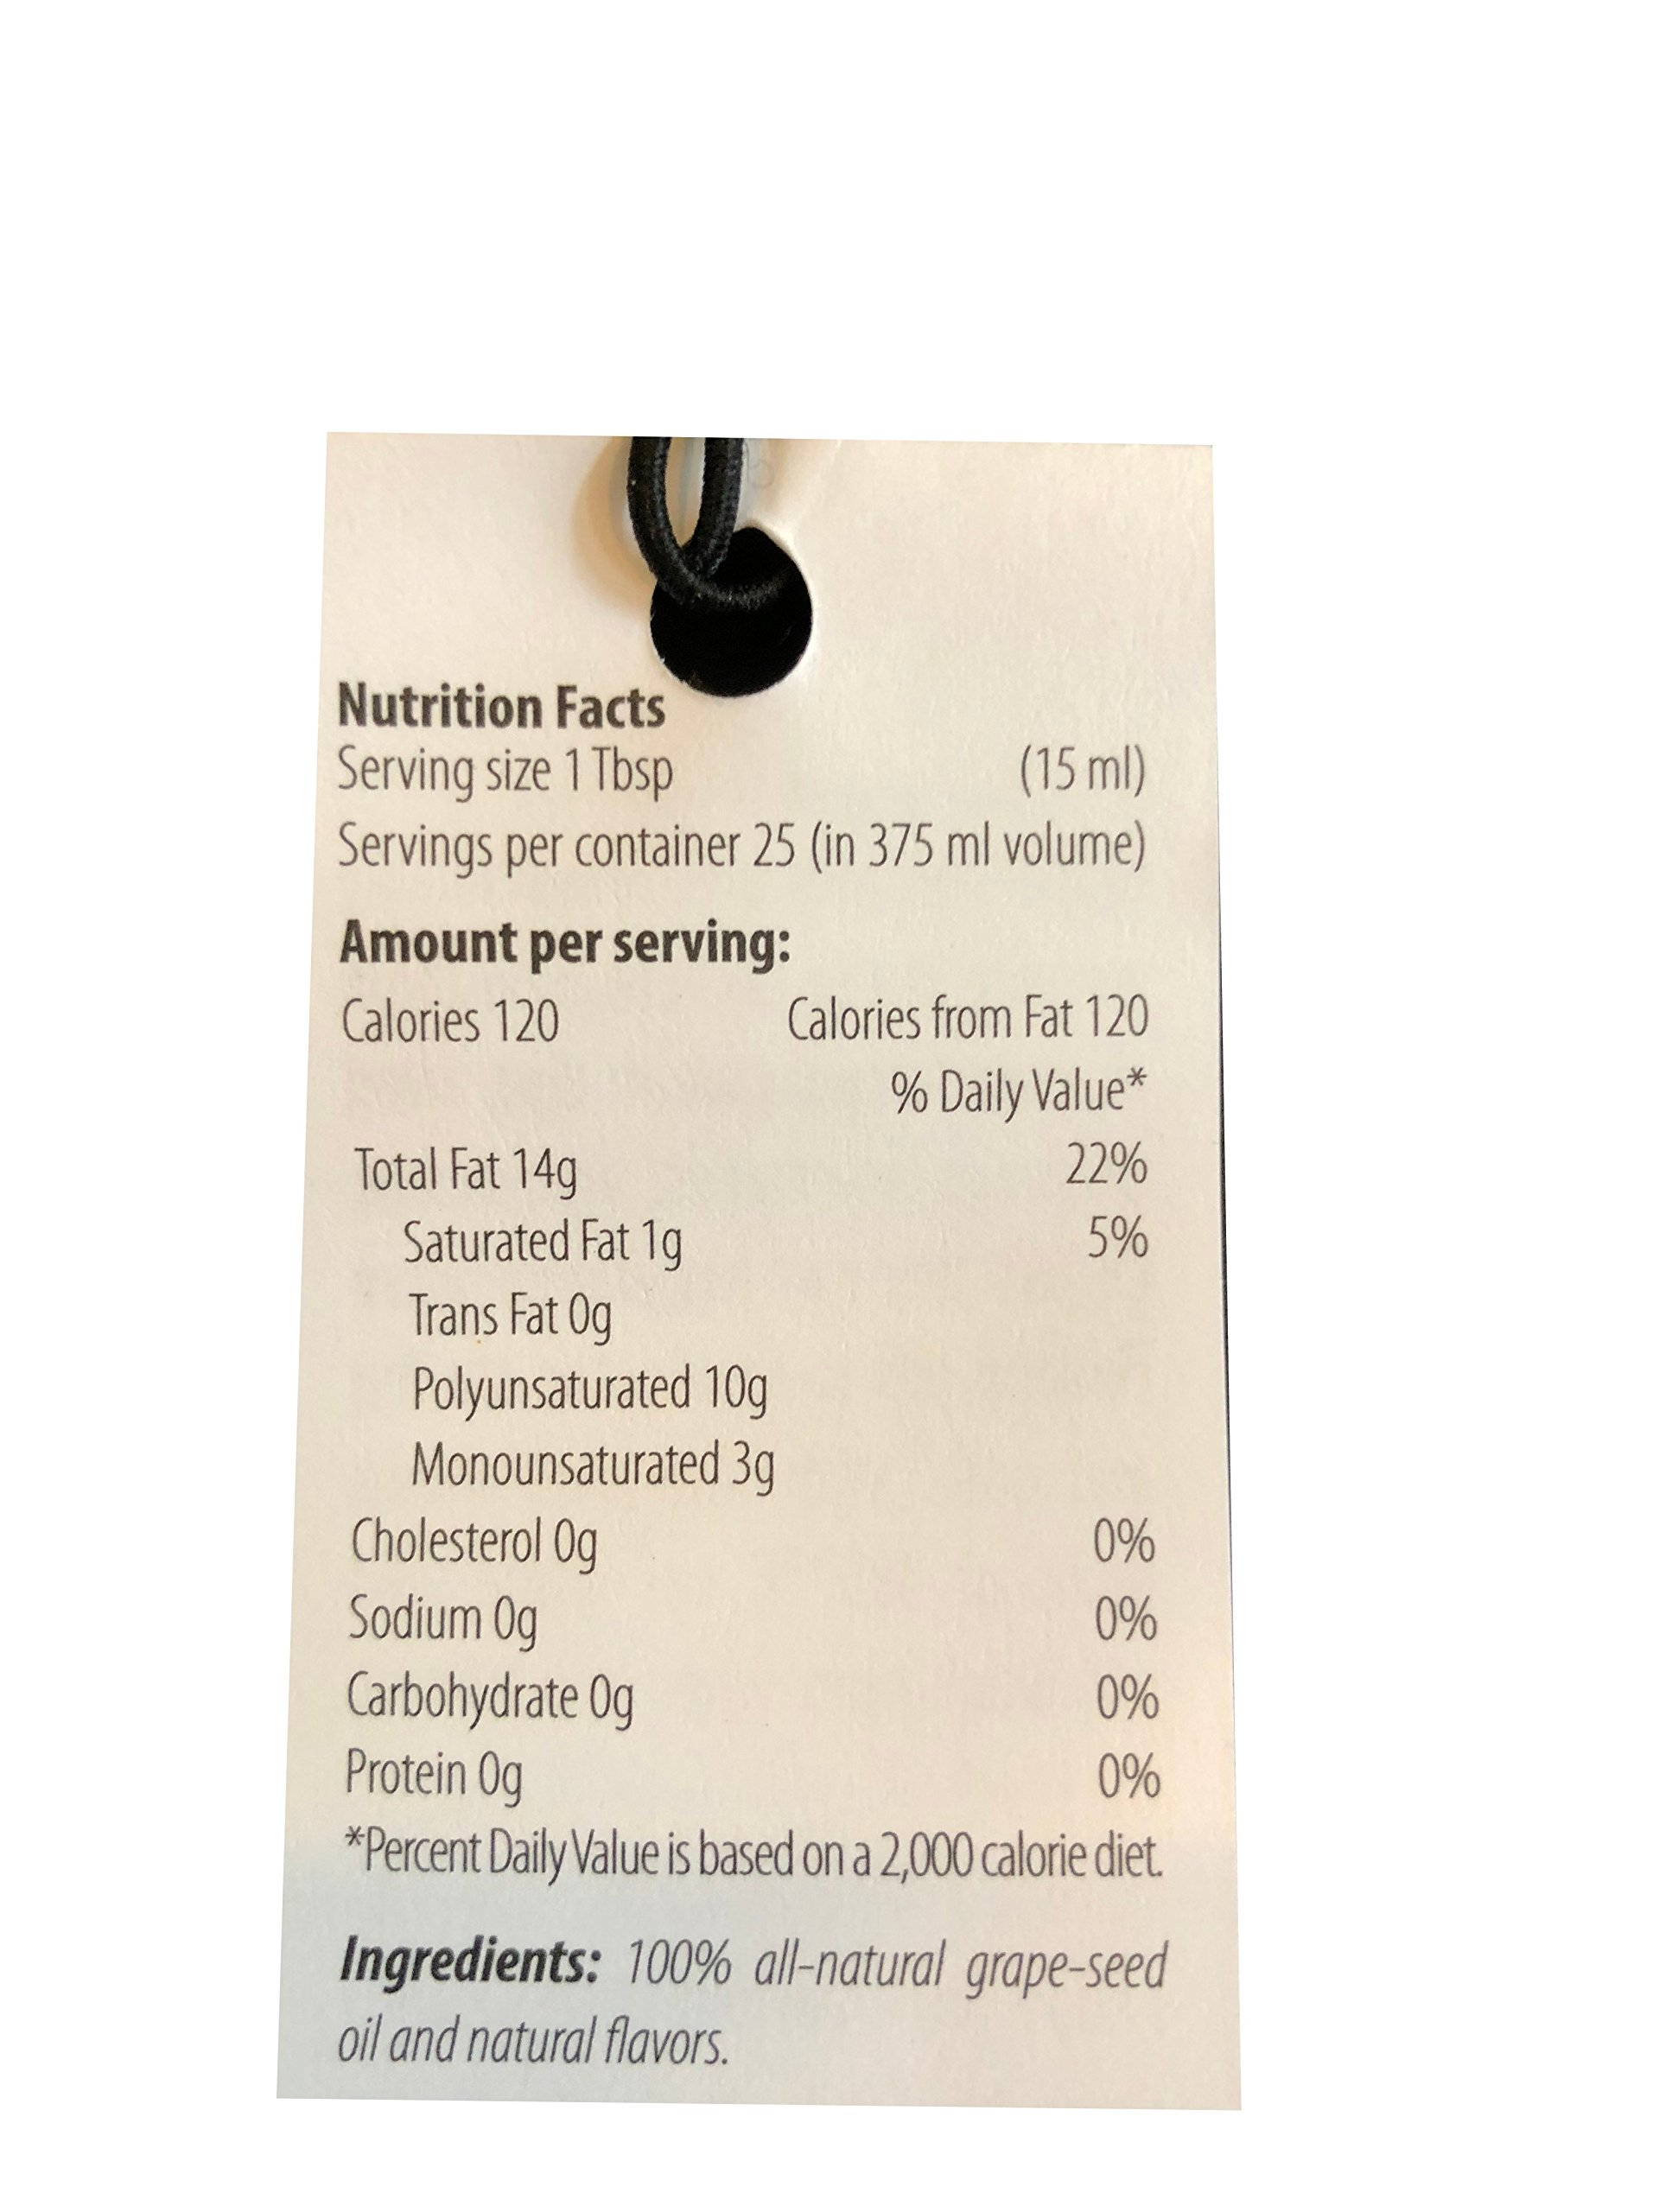 Apres Vin Chardonnay Fumé Grape Seed Oil - 375ml - 2 Pack by Apres Vin (Image #1)